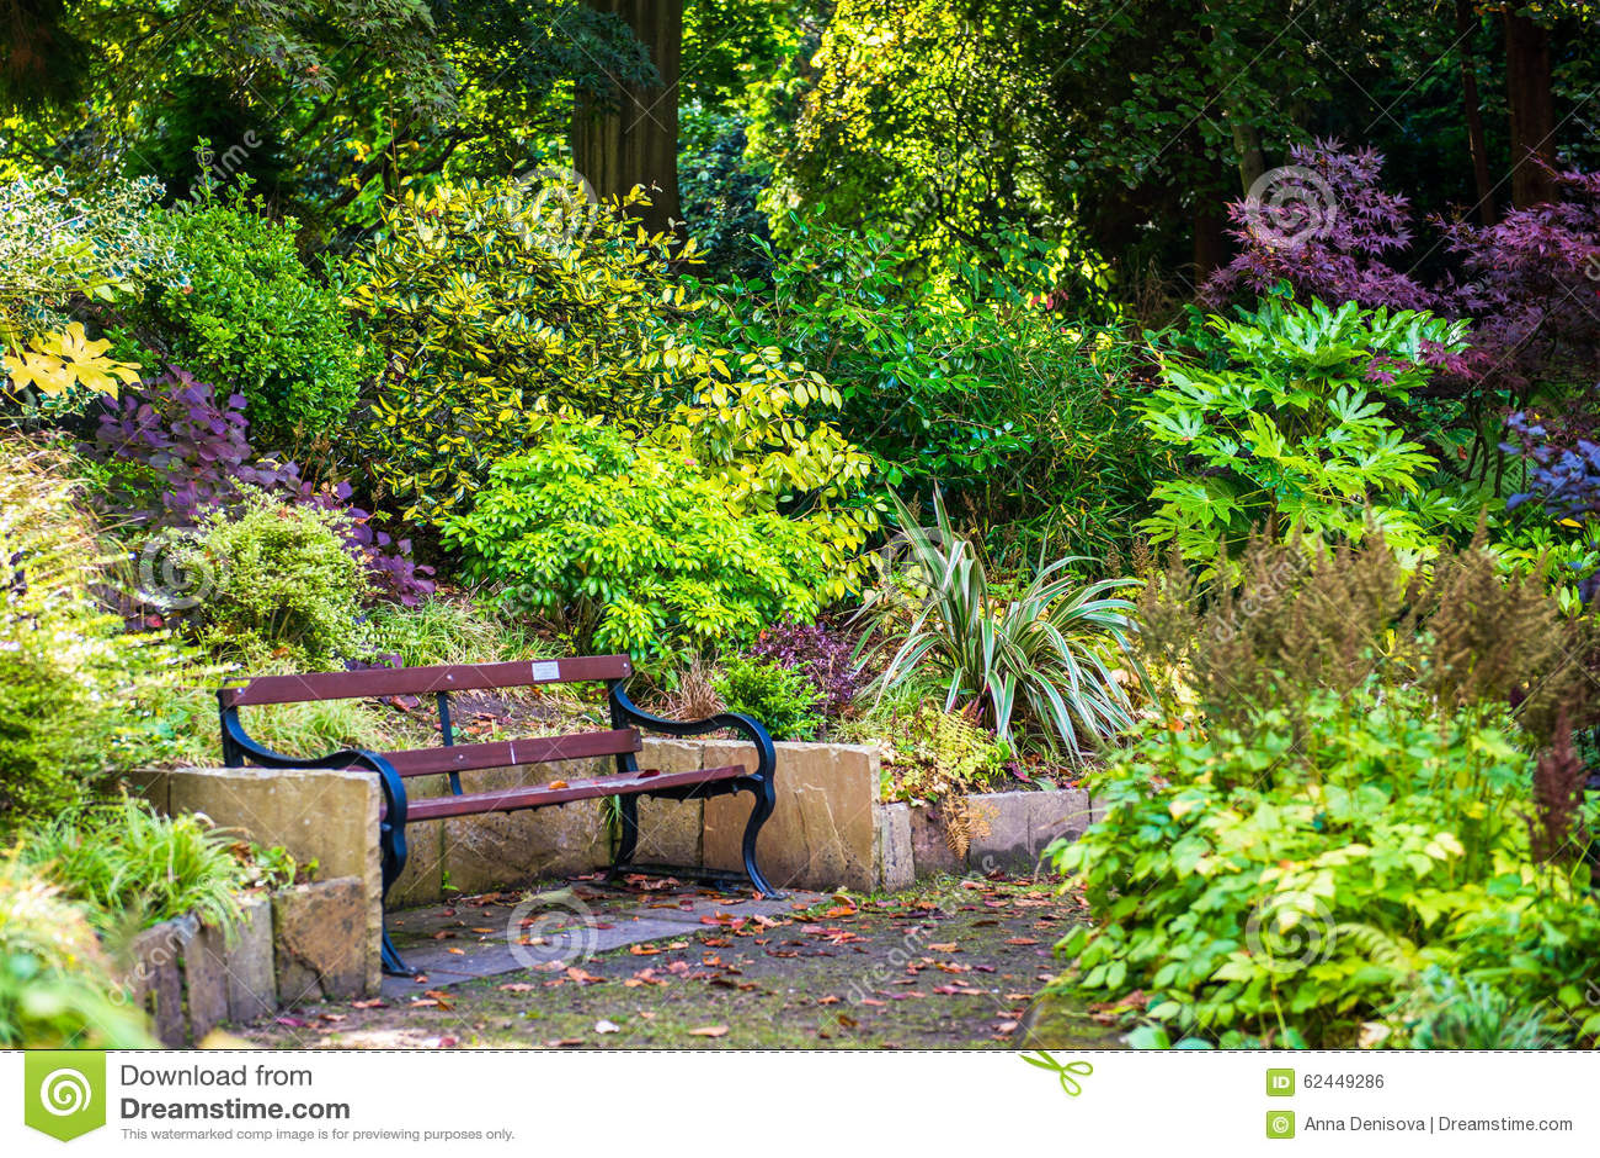 Beau Jardin Anglais Color Pendant L 39 Automne Angleterre